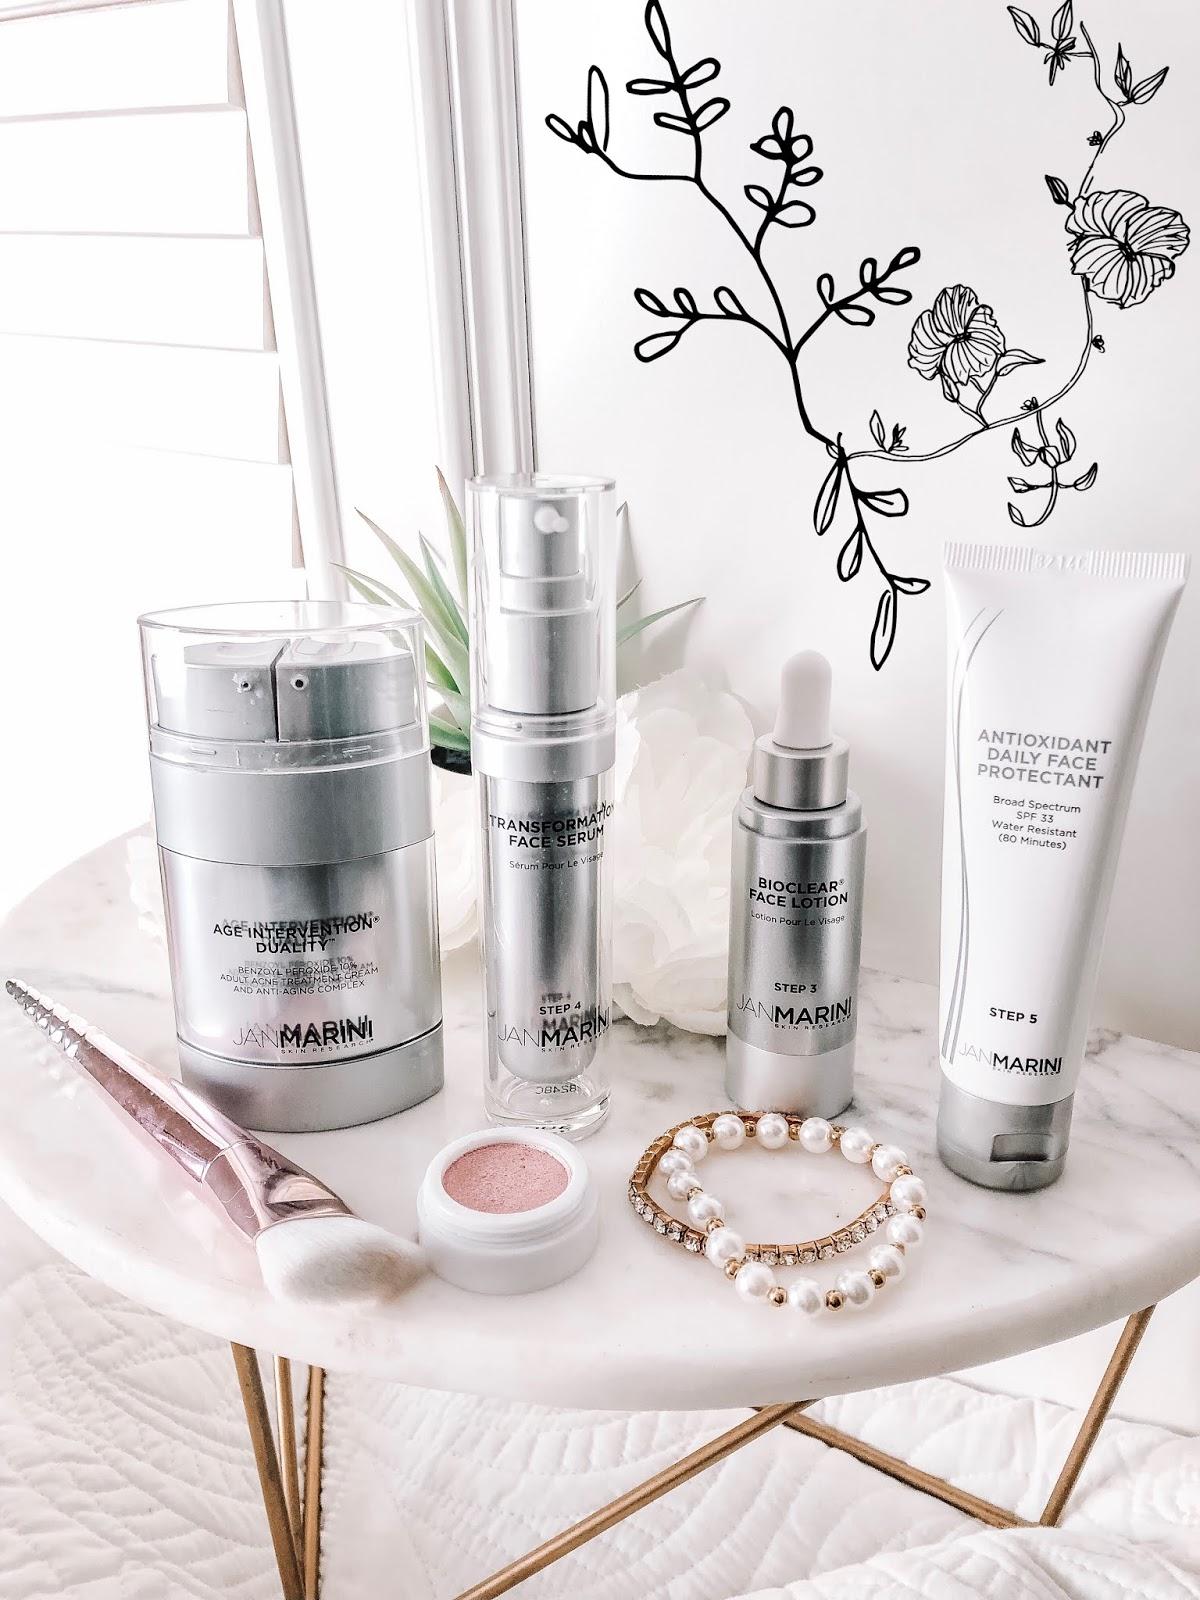 Jan Marini Skincare Routine